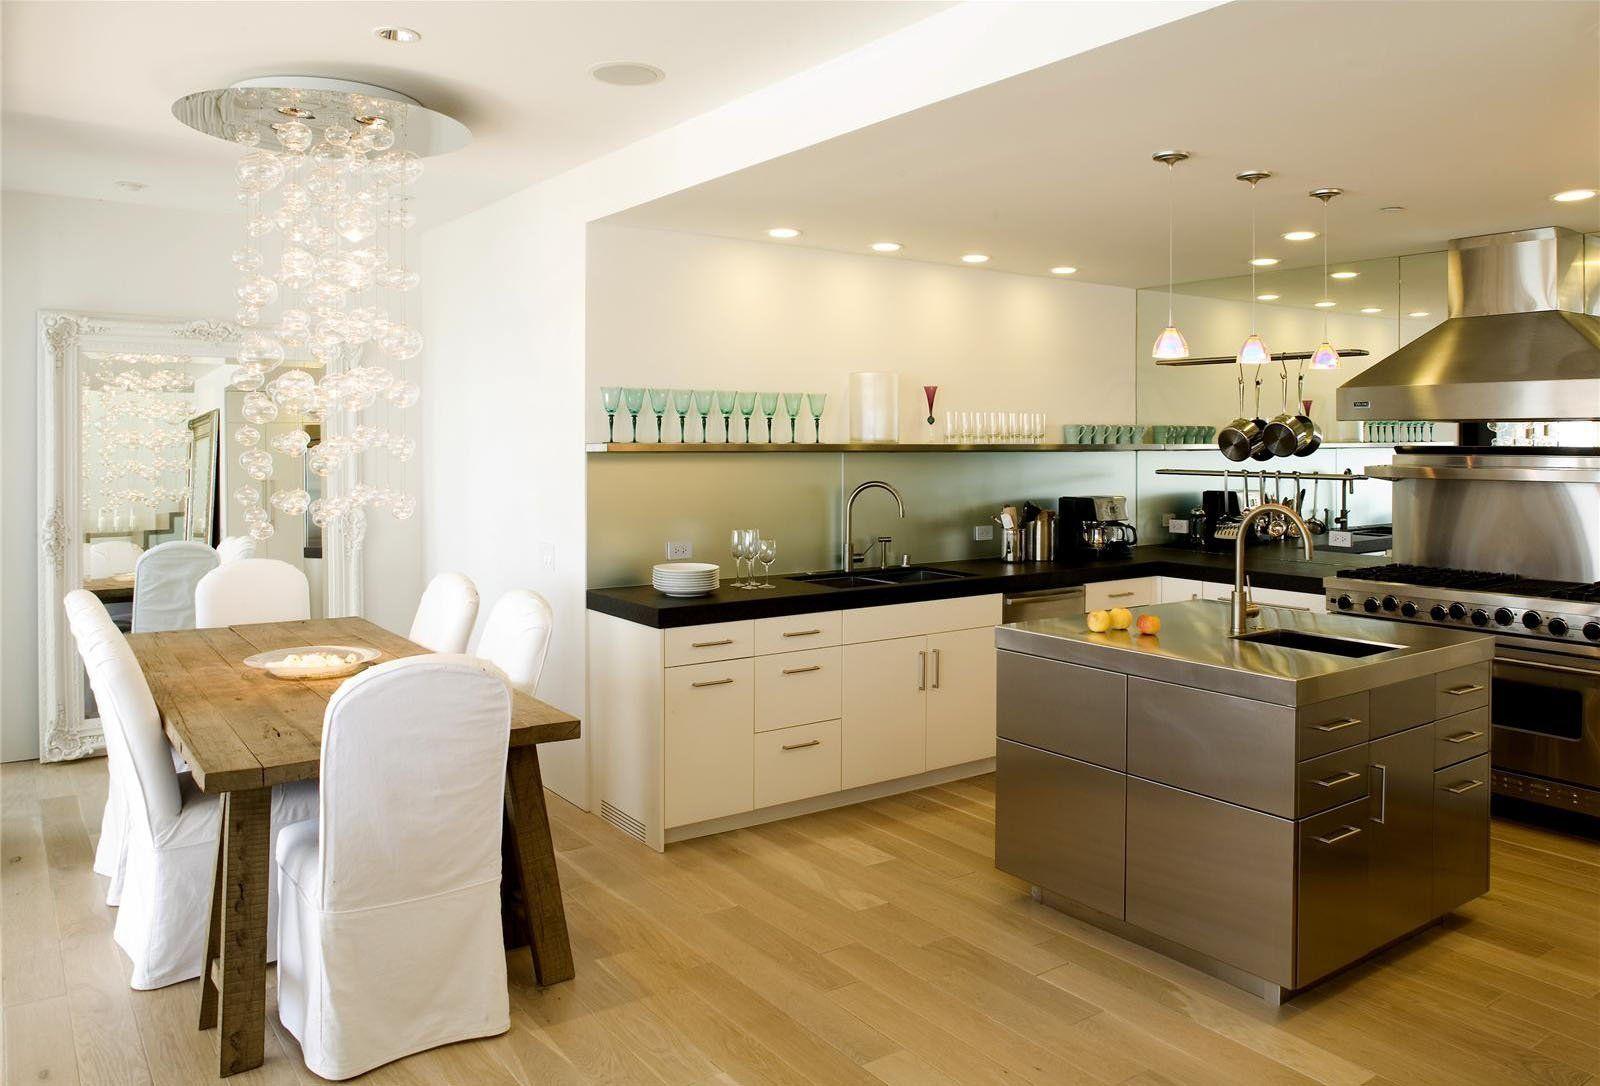 Cozinha americana kitchen ideas pinterest kitchens and house